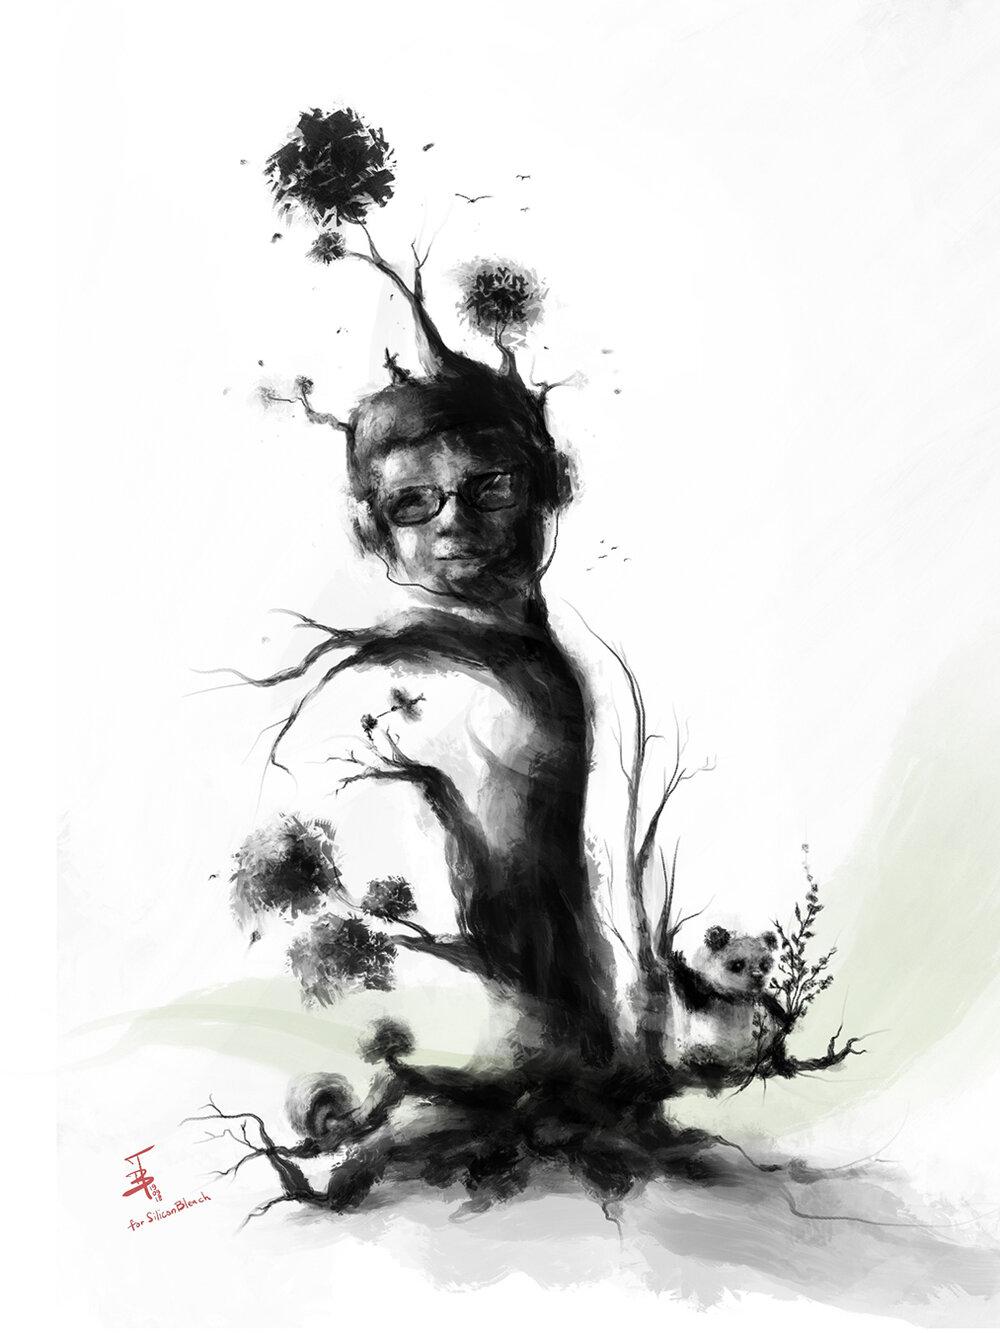 Binh_tran - Metamorphosis